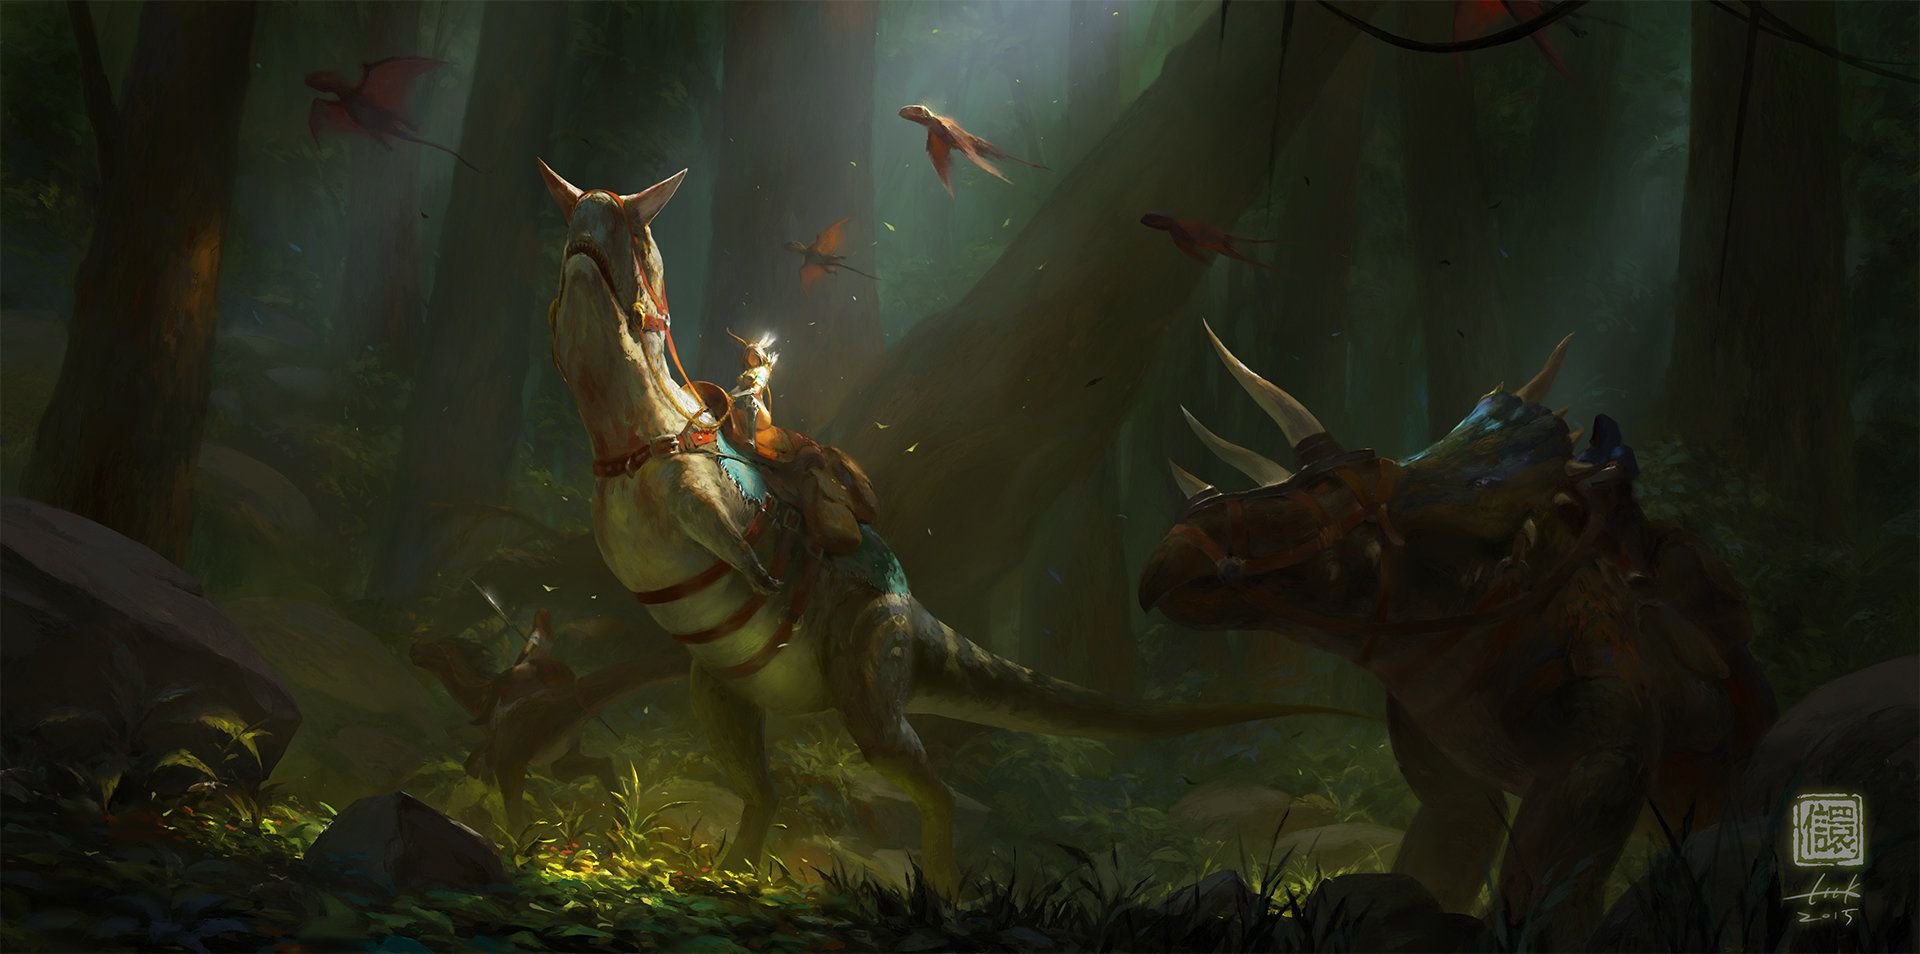 ArtStation - In the Forest, Kan Liu(666K信譞)